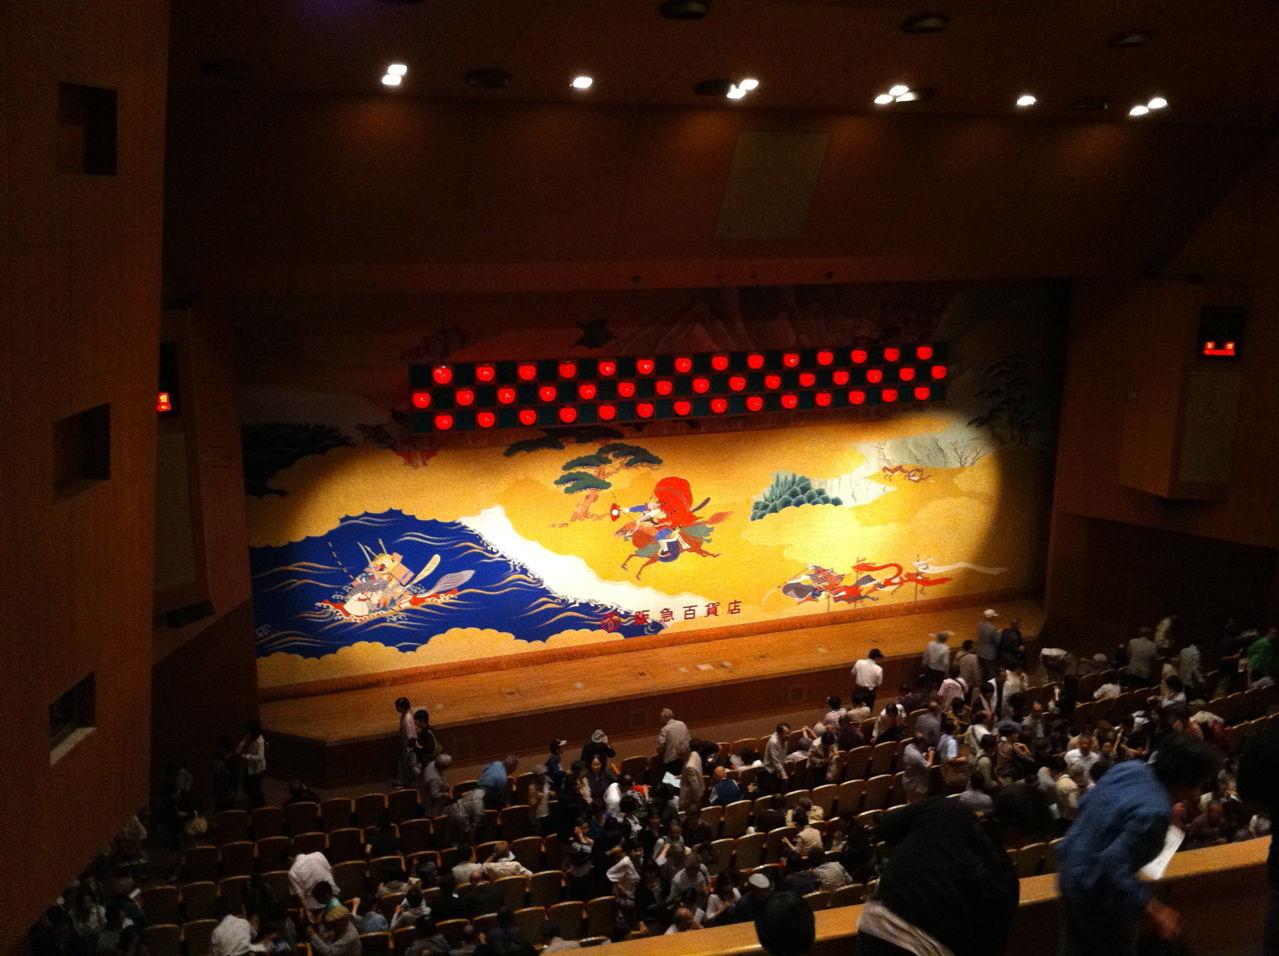 神戸文化ホール・中ホールの緞帳